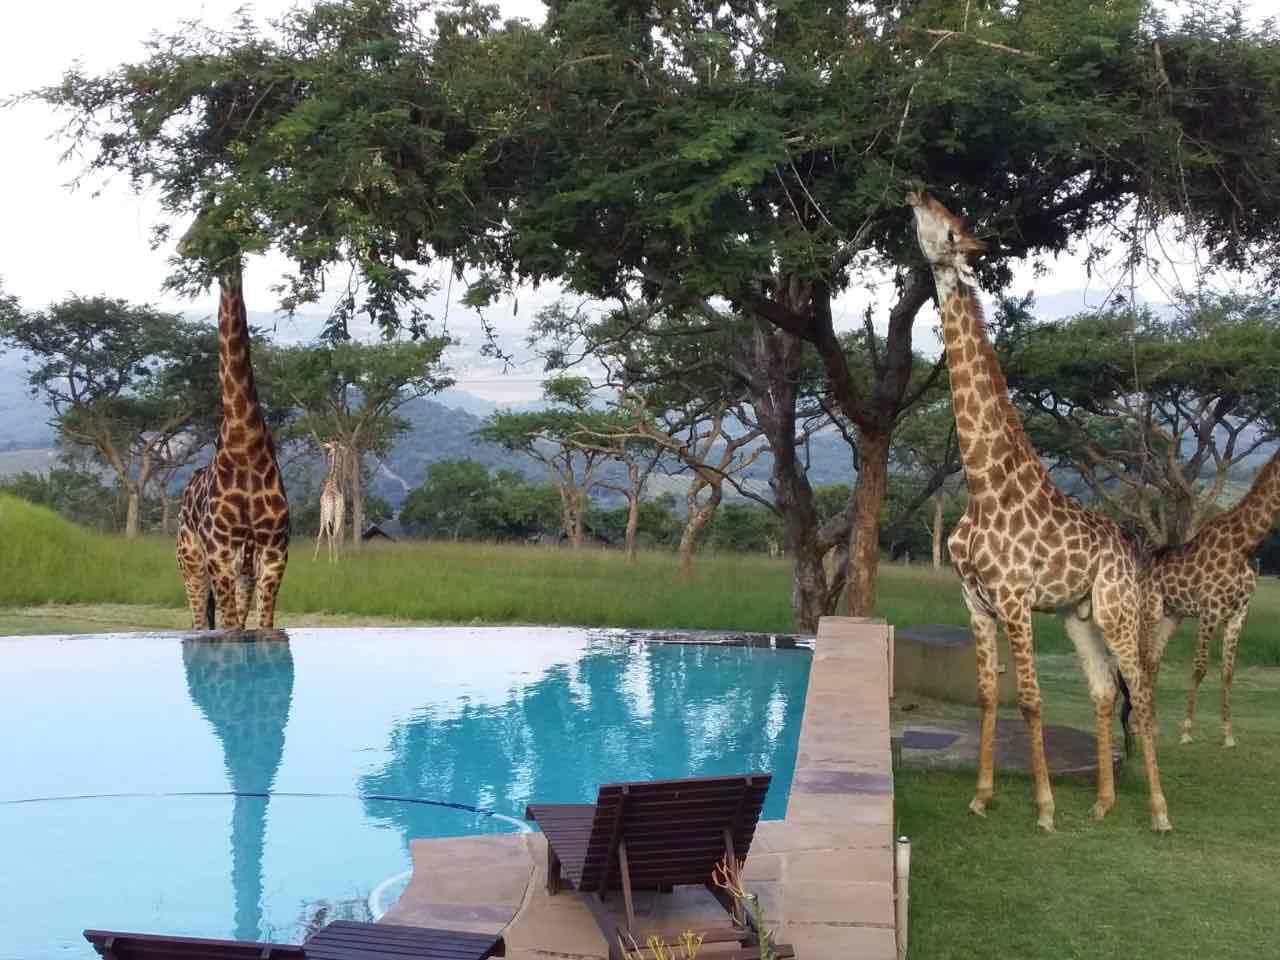 Giraffe__Muluwa_Whiteriver_ poolside